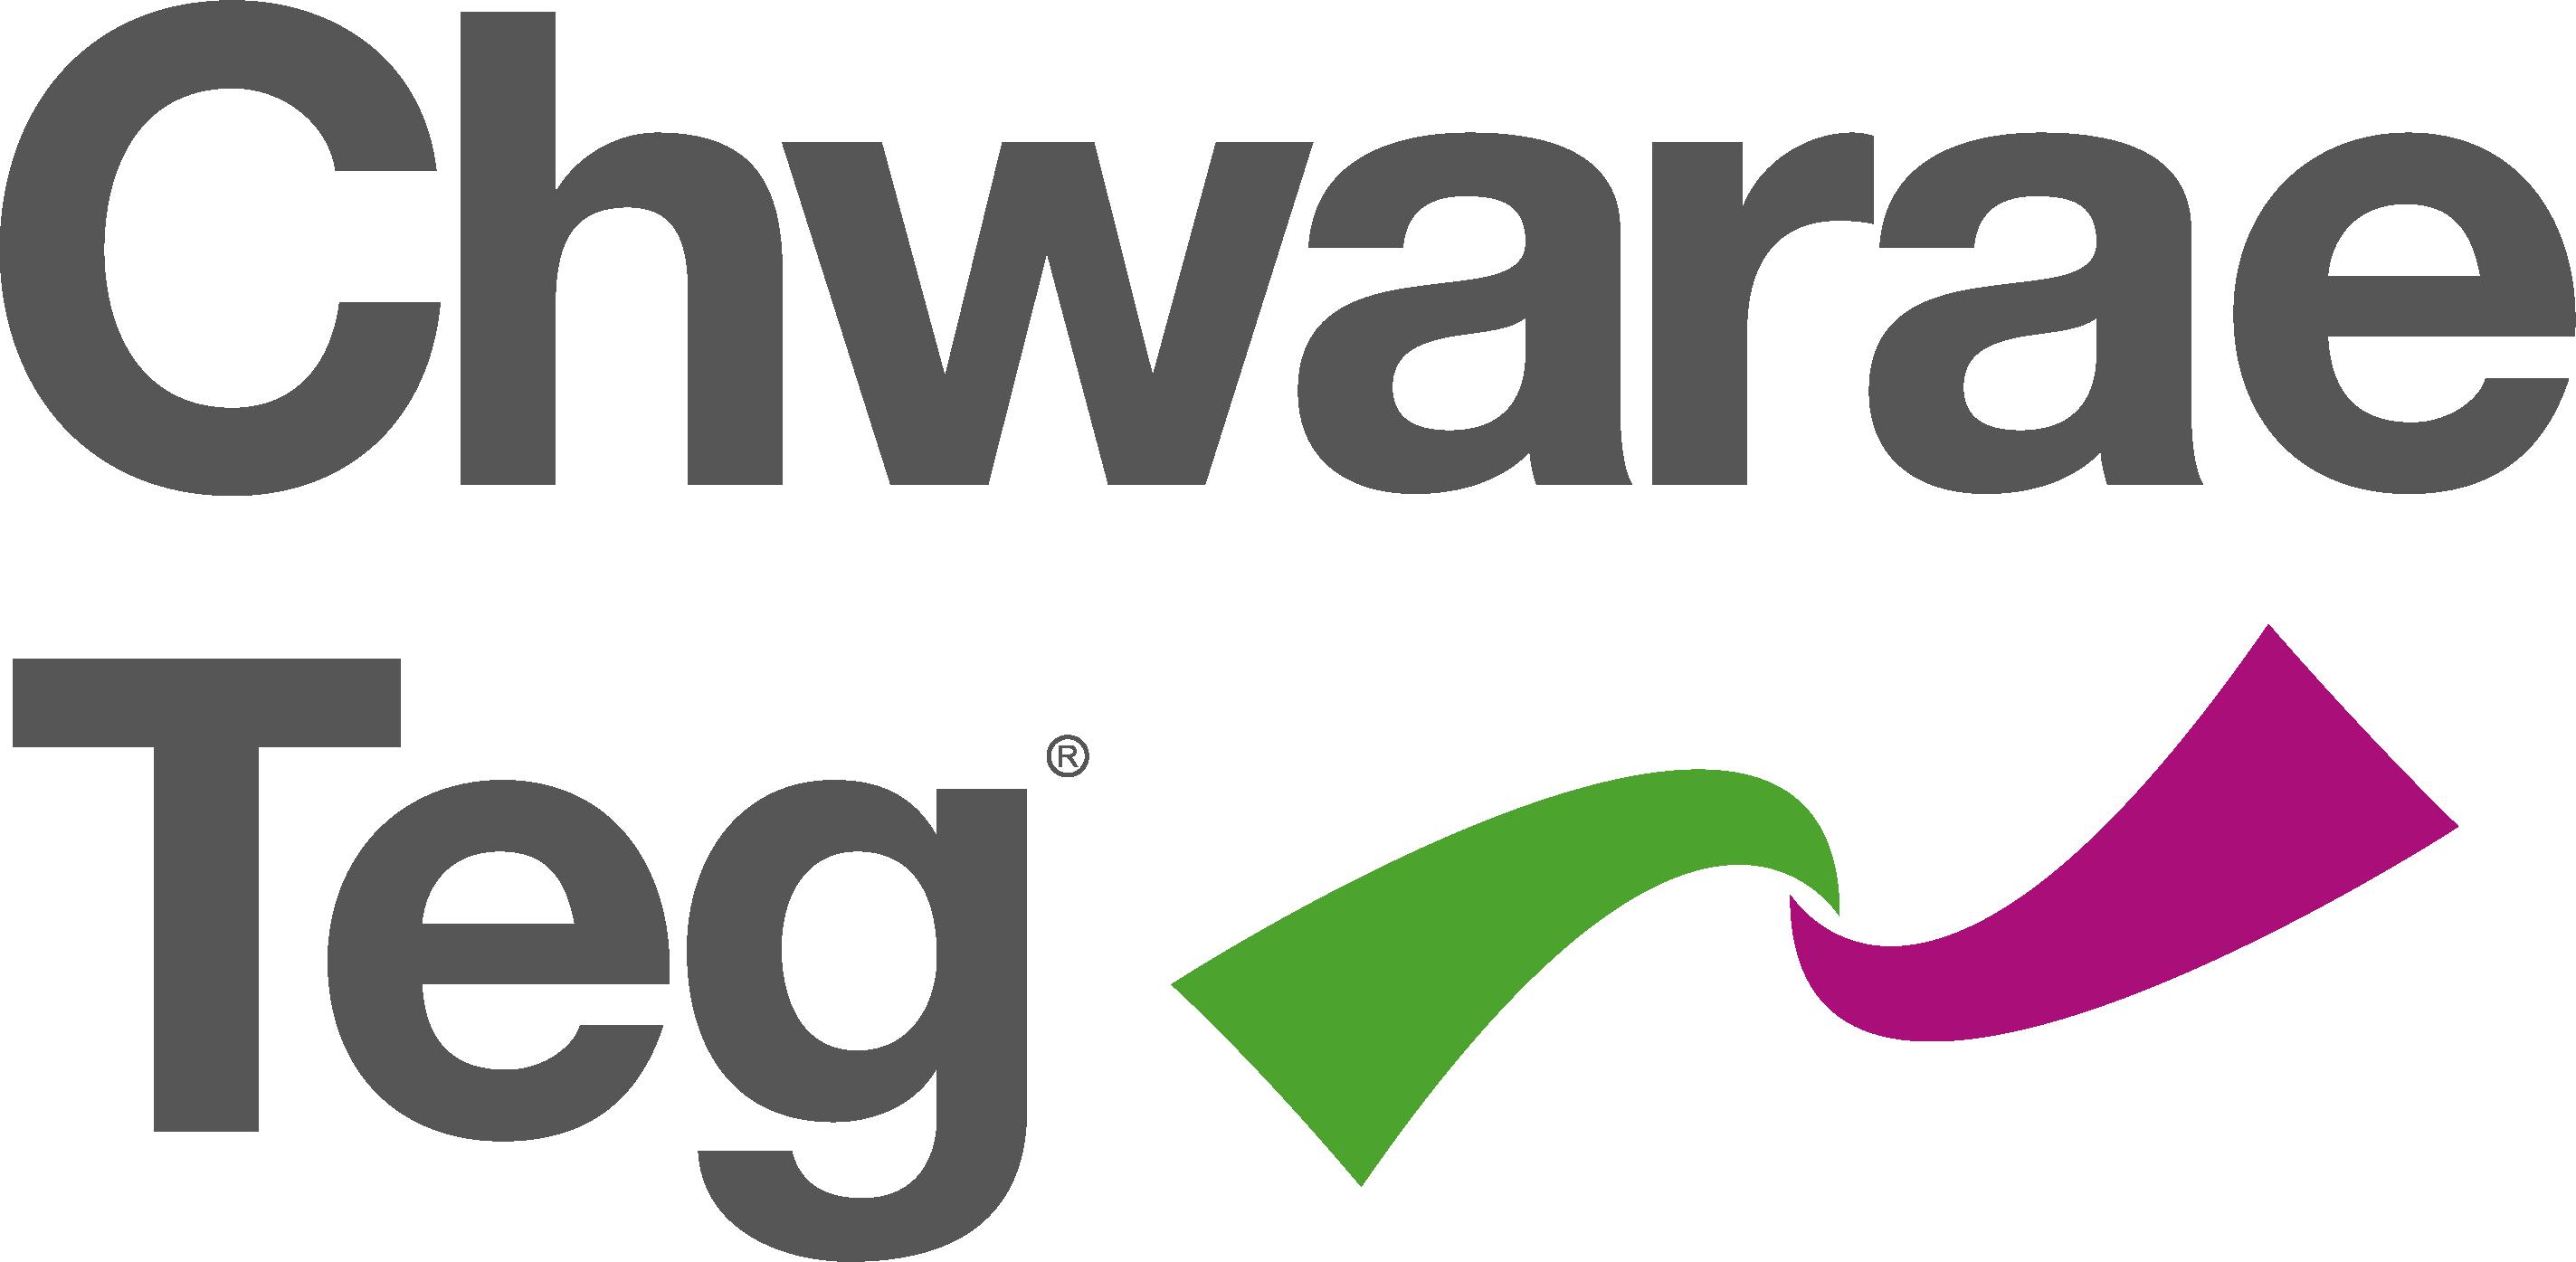 EPS chwaraeteg logo